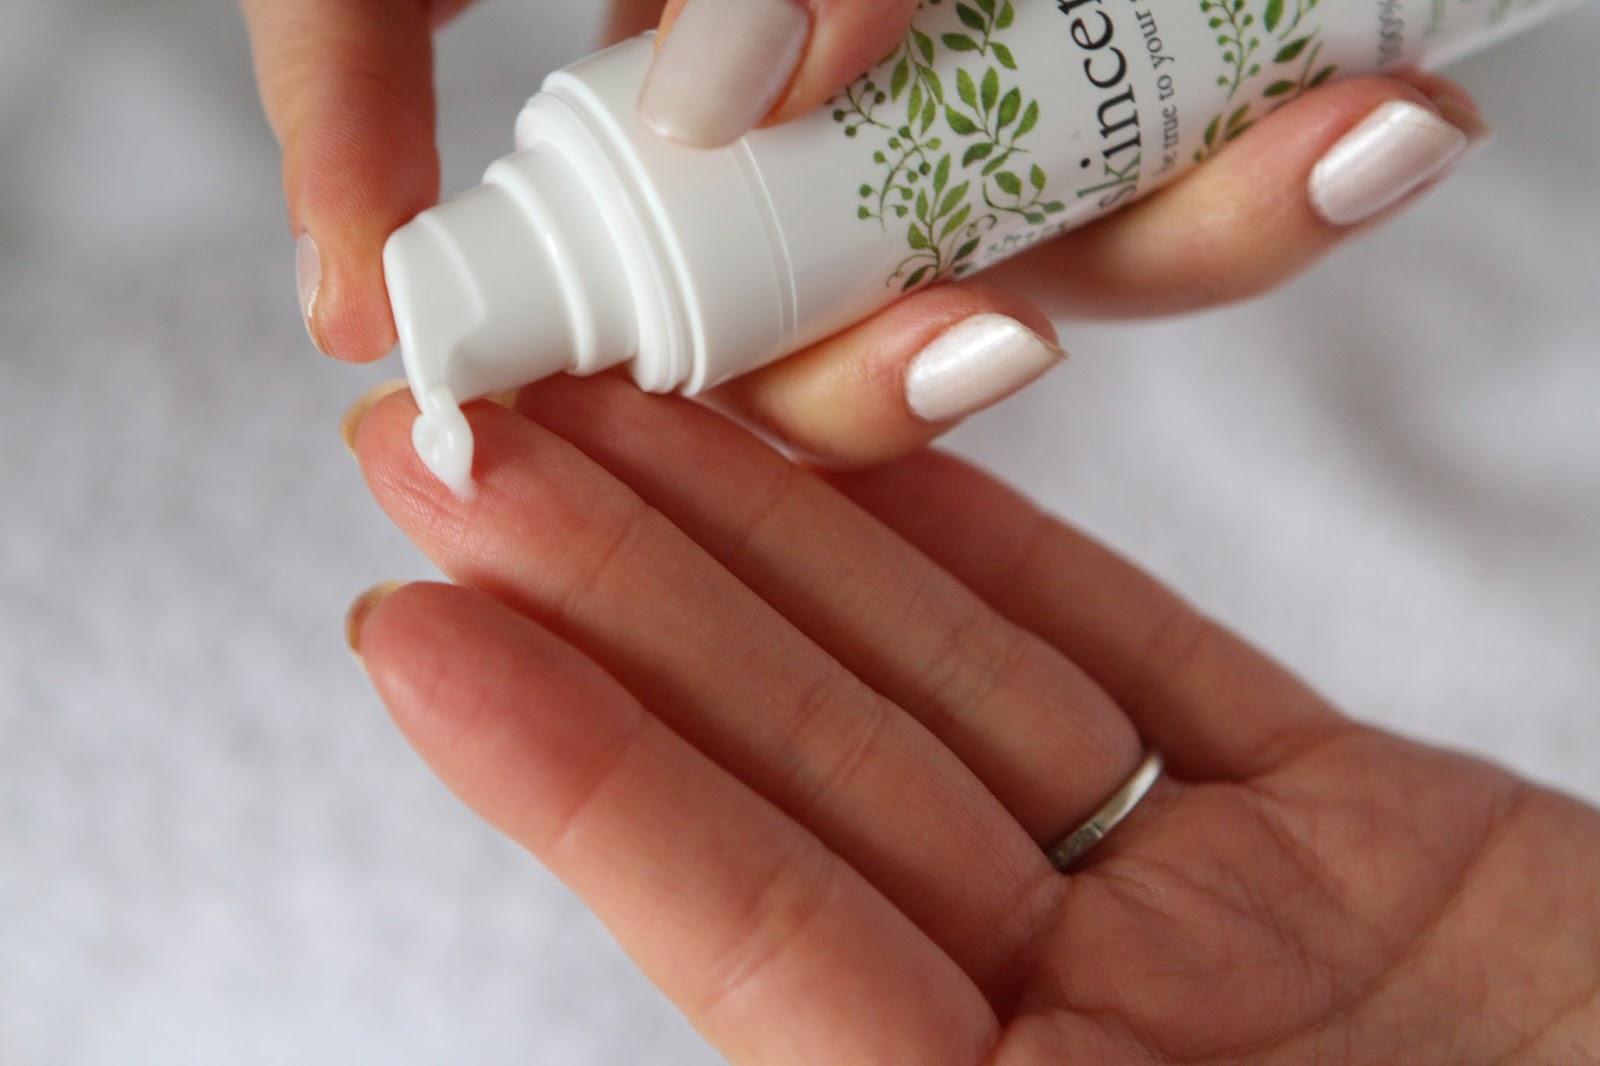 Skincere natural skincare